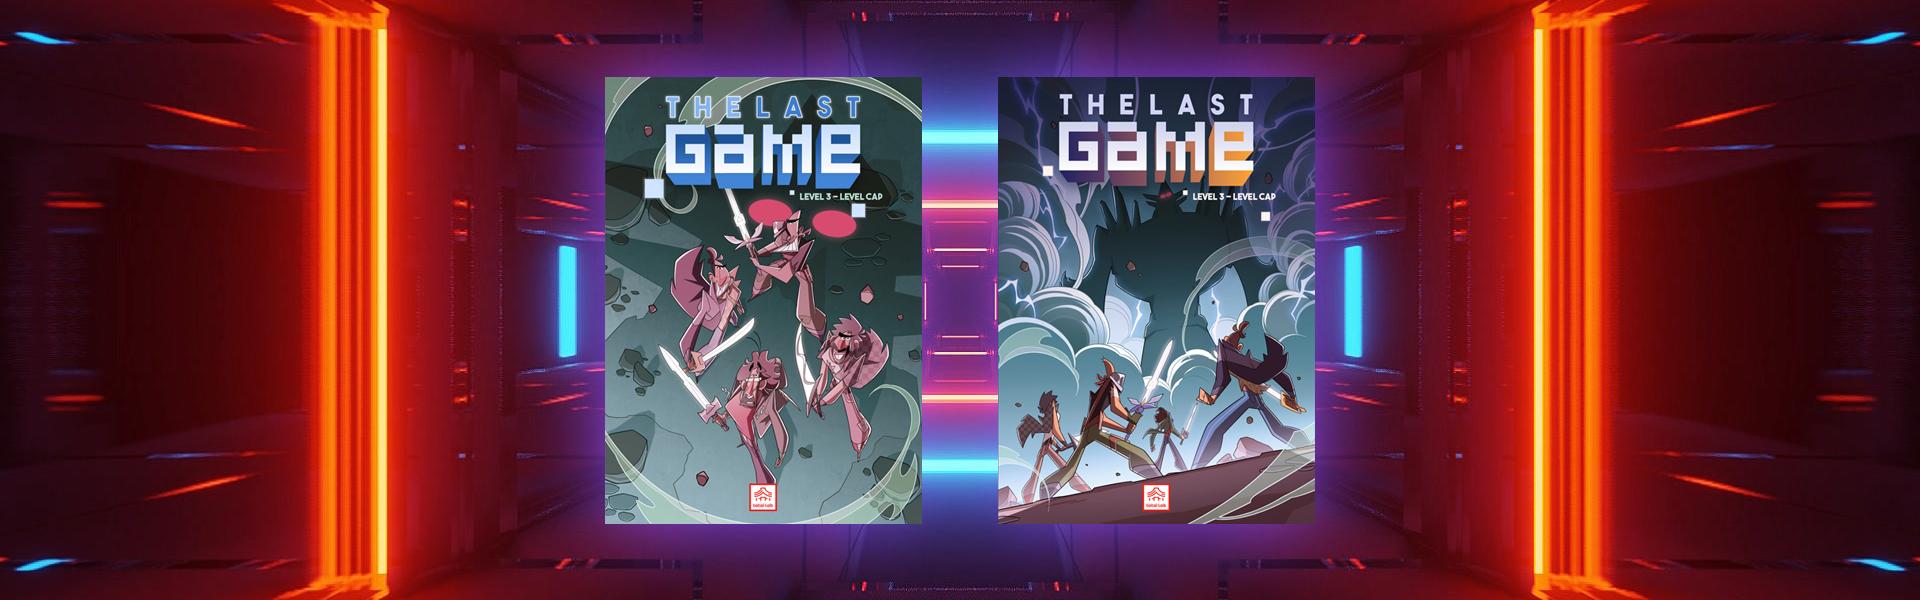 The Last Game vol. 3 - Everyeye.it